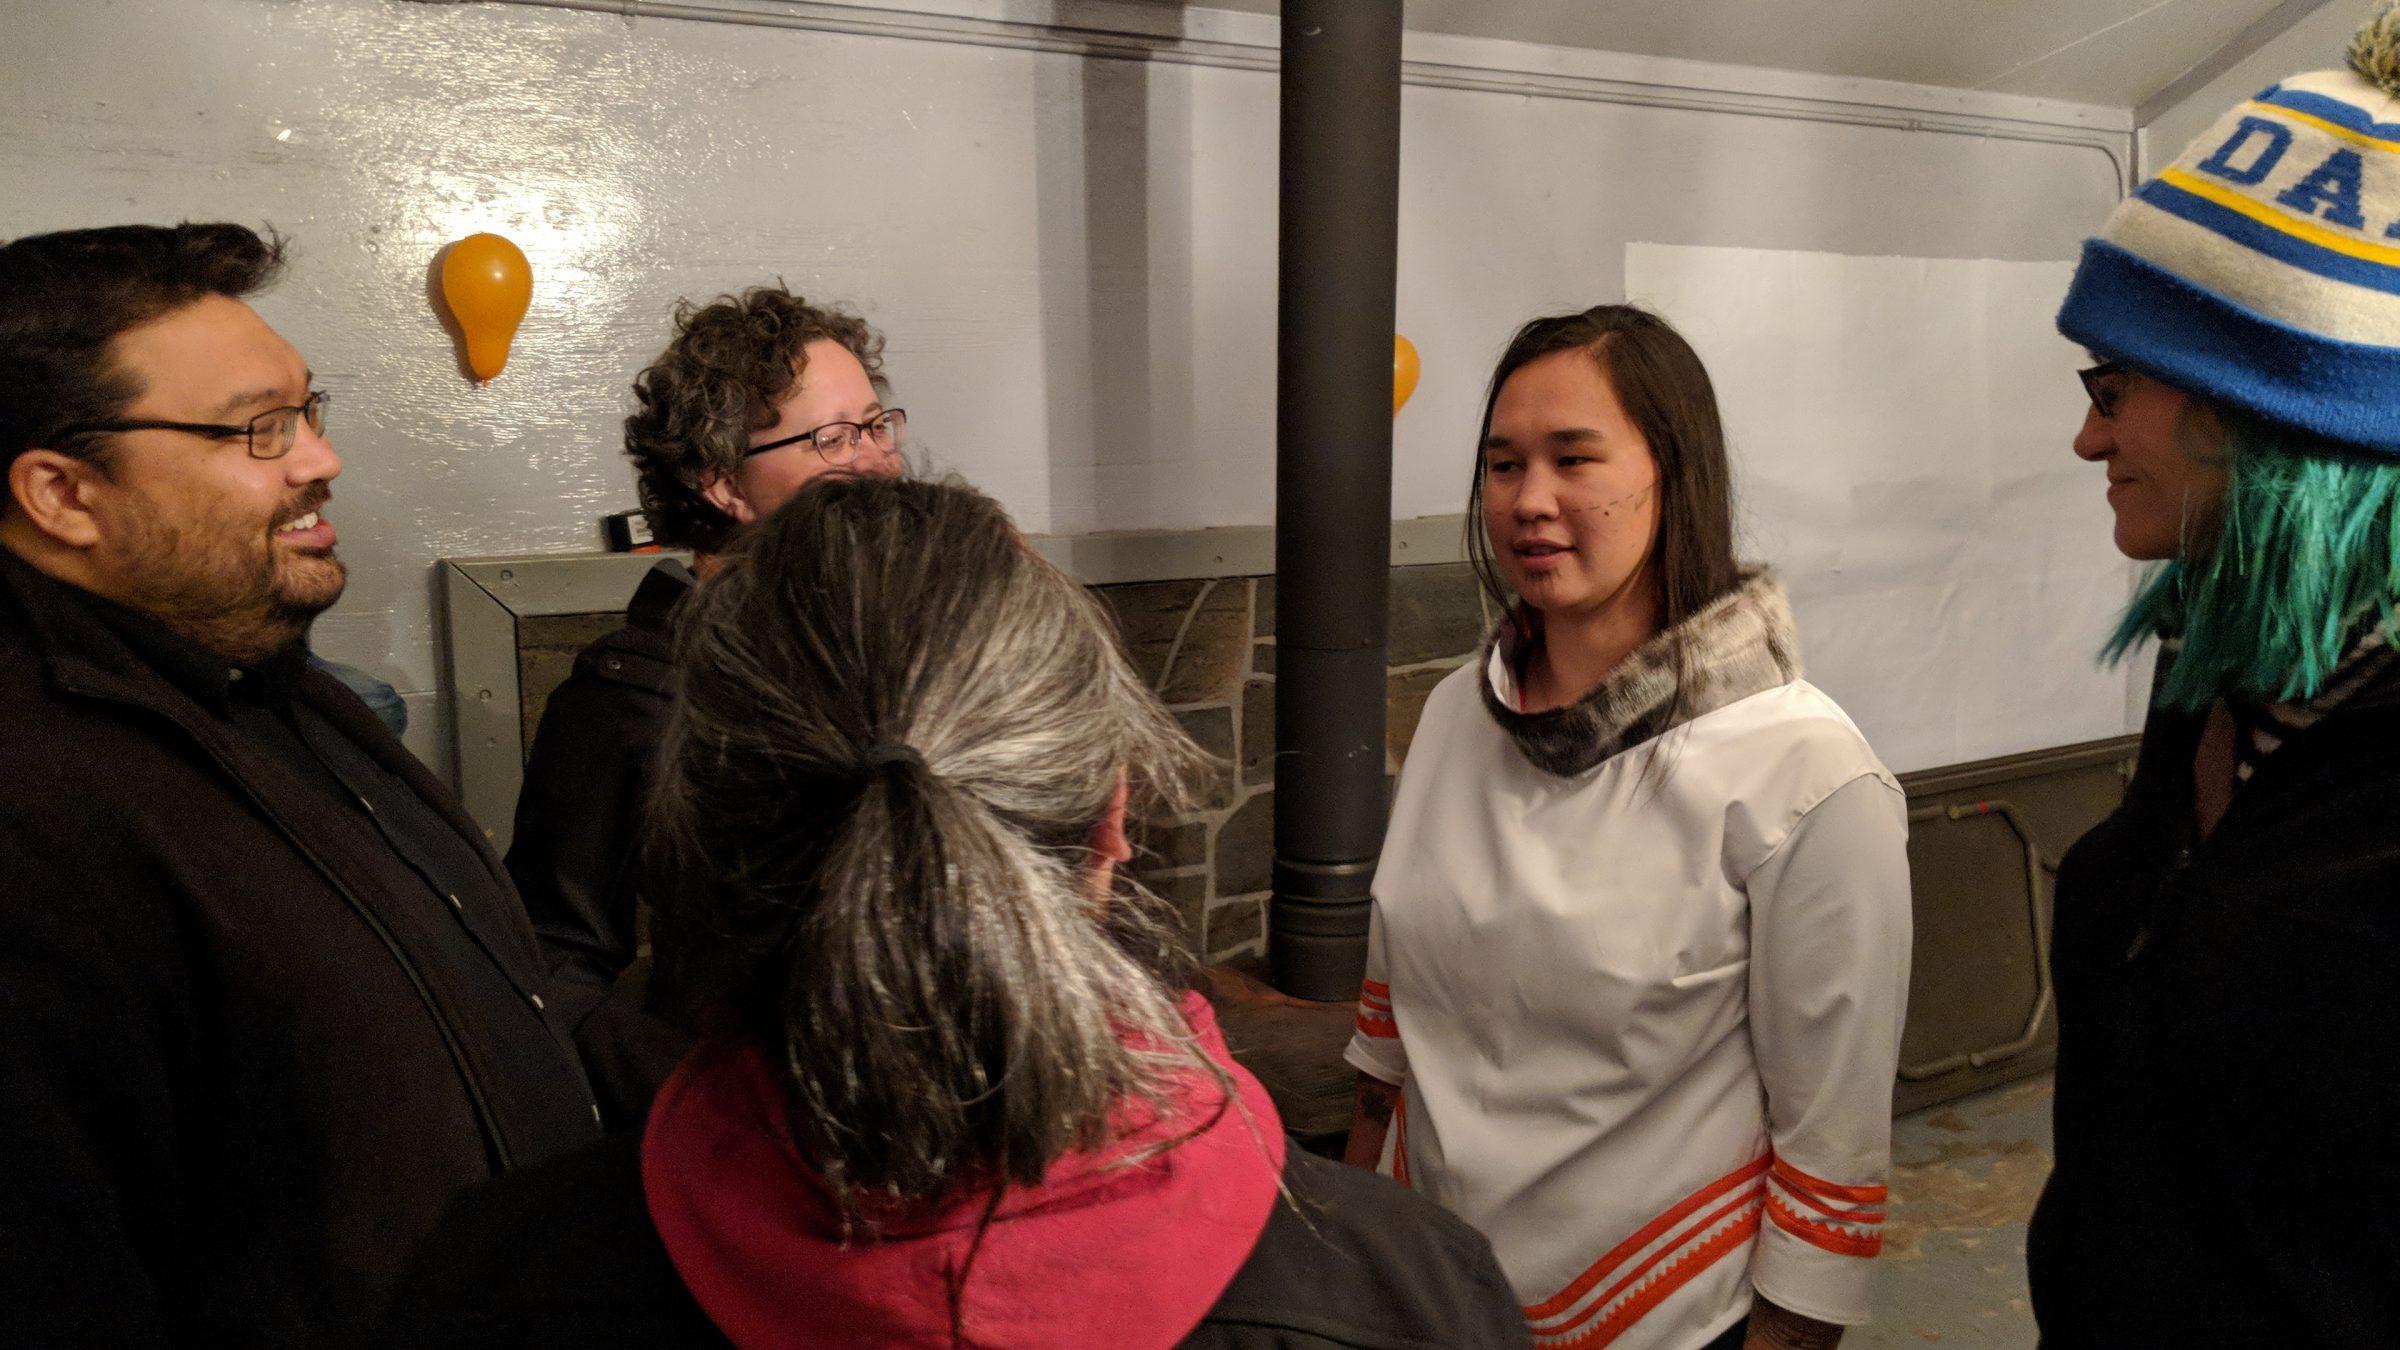 Federal election shakeup: New Democrats take Nunavut, Bloc secures Nunavik | Nunatsiaq News